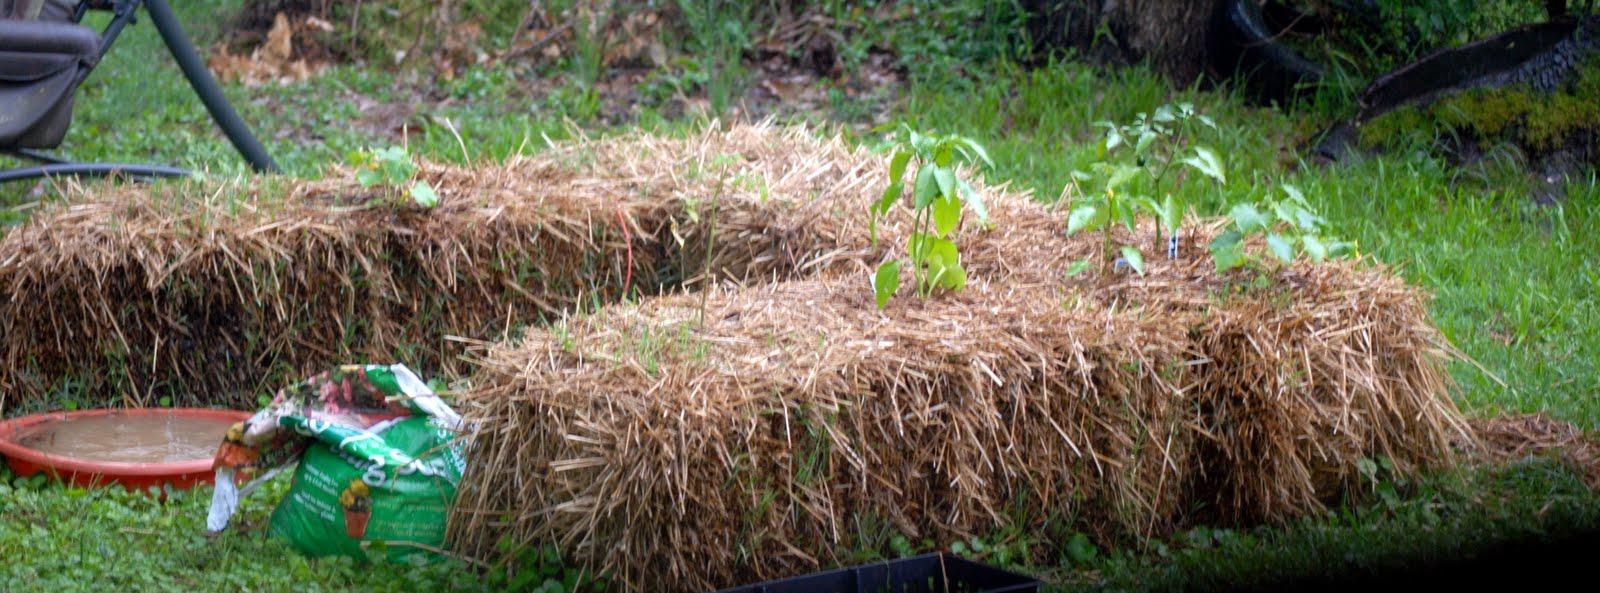 Remembrances of An Arkansas Stamper: Hay Bale Gardening